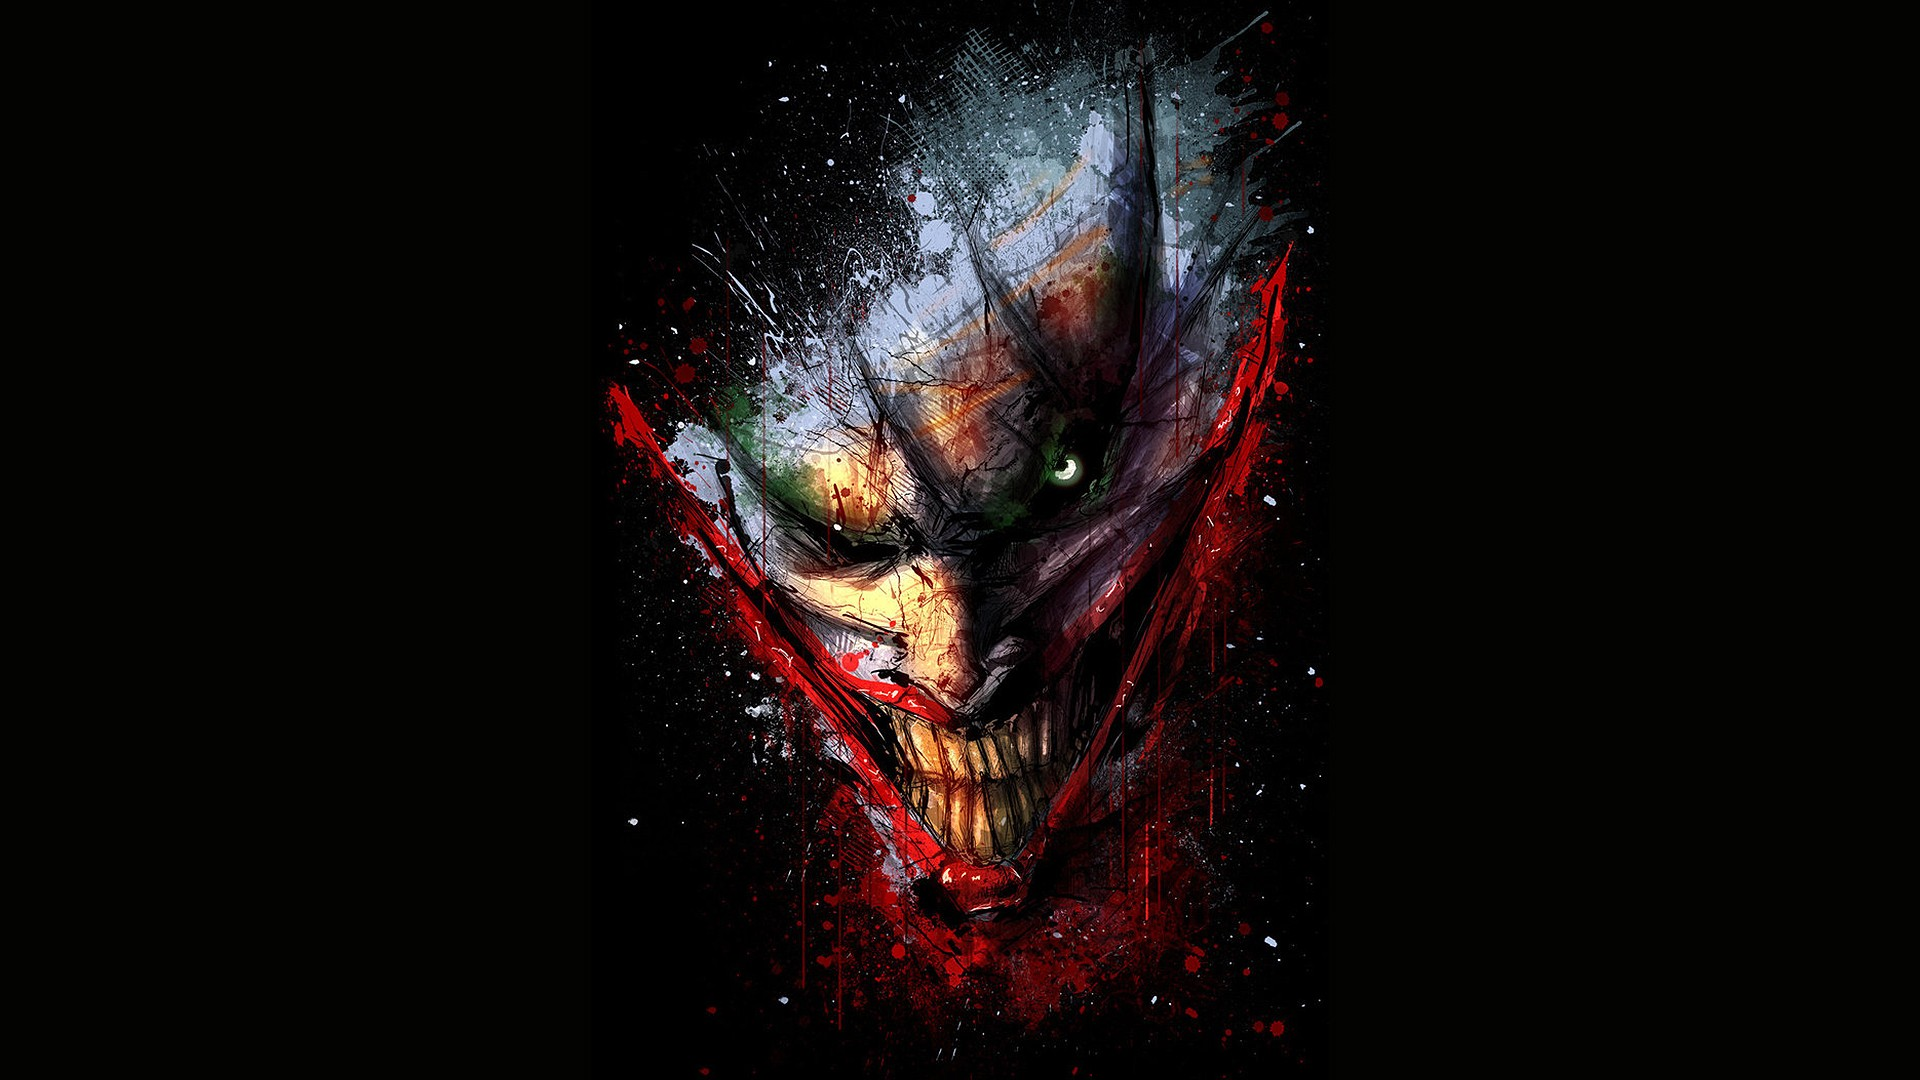 Joker HD Wallpaper   Hintergrund   1920x1080   ID:429889 ...